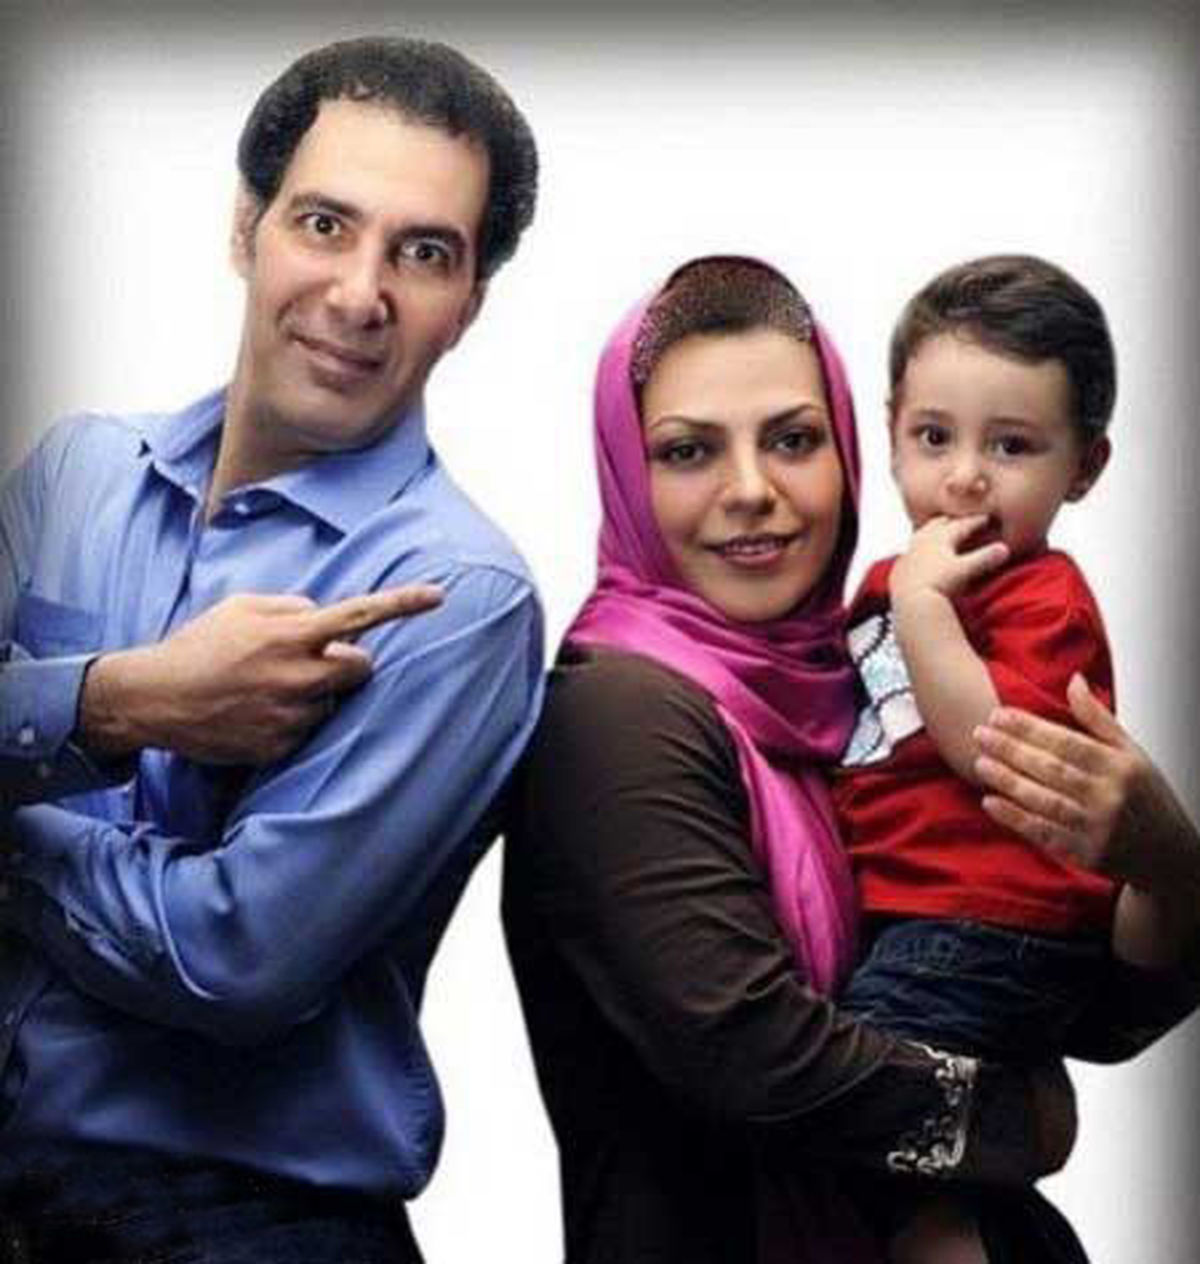 همسر بی حجاب بهنام تشکر + عکس